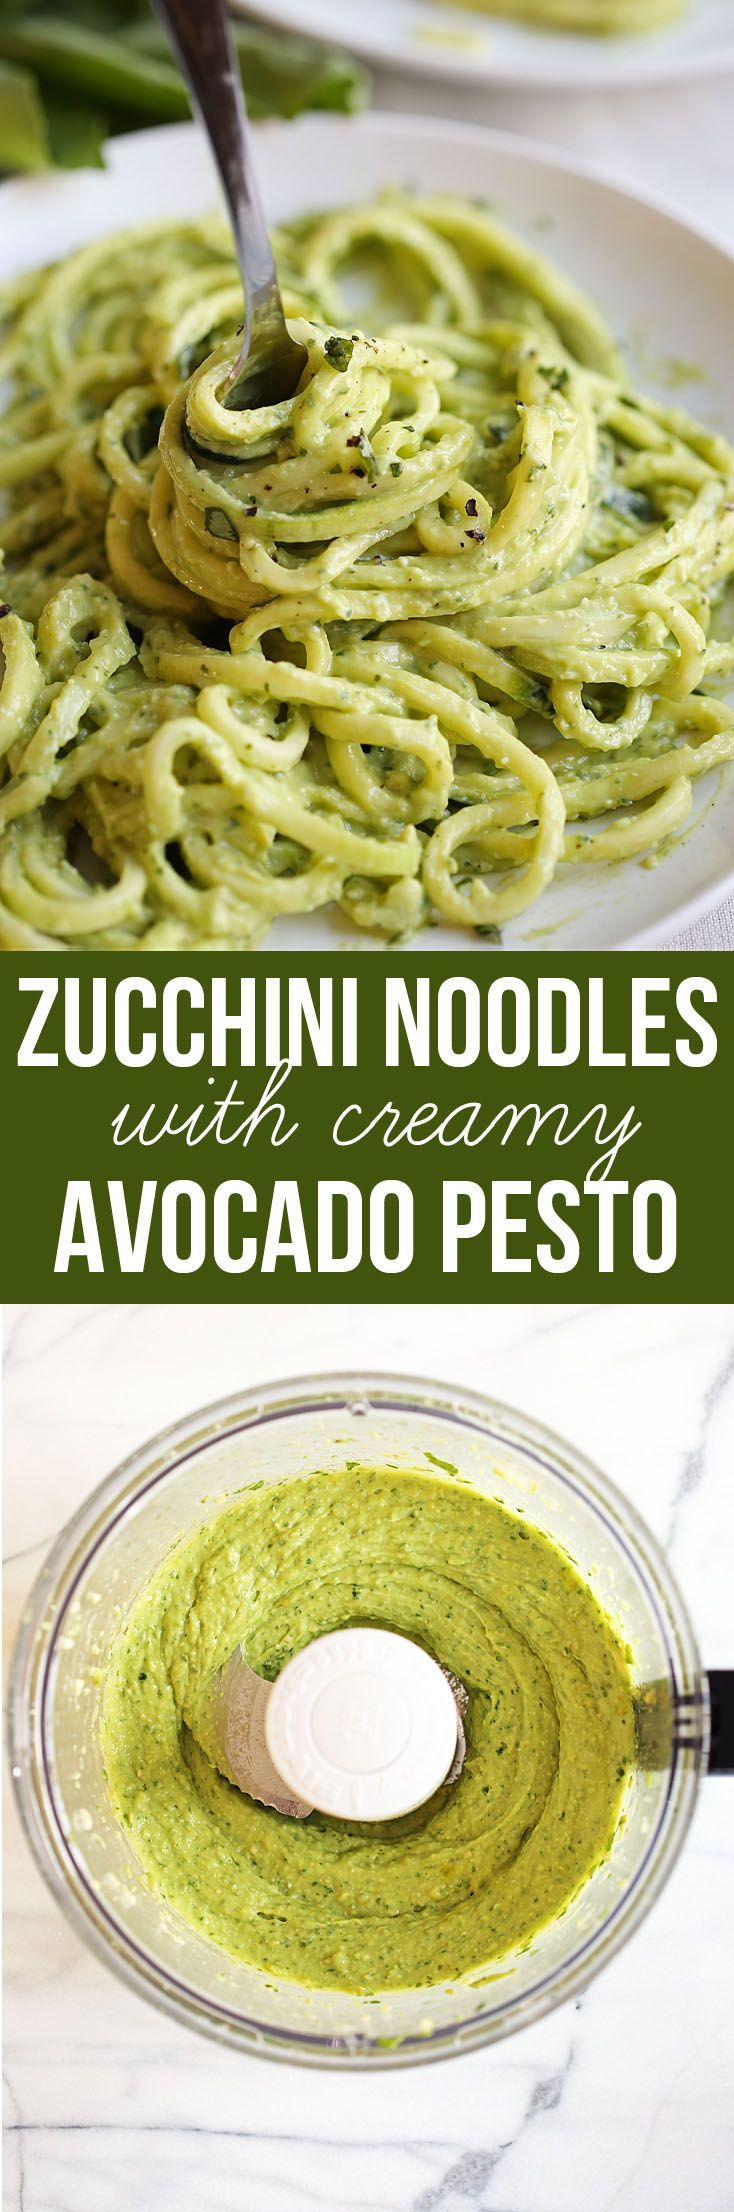 Zucchini Noodles with Creamy Avocado Pesto | Eat Yourself Skinny